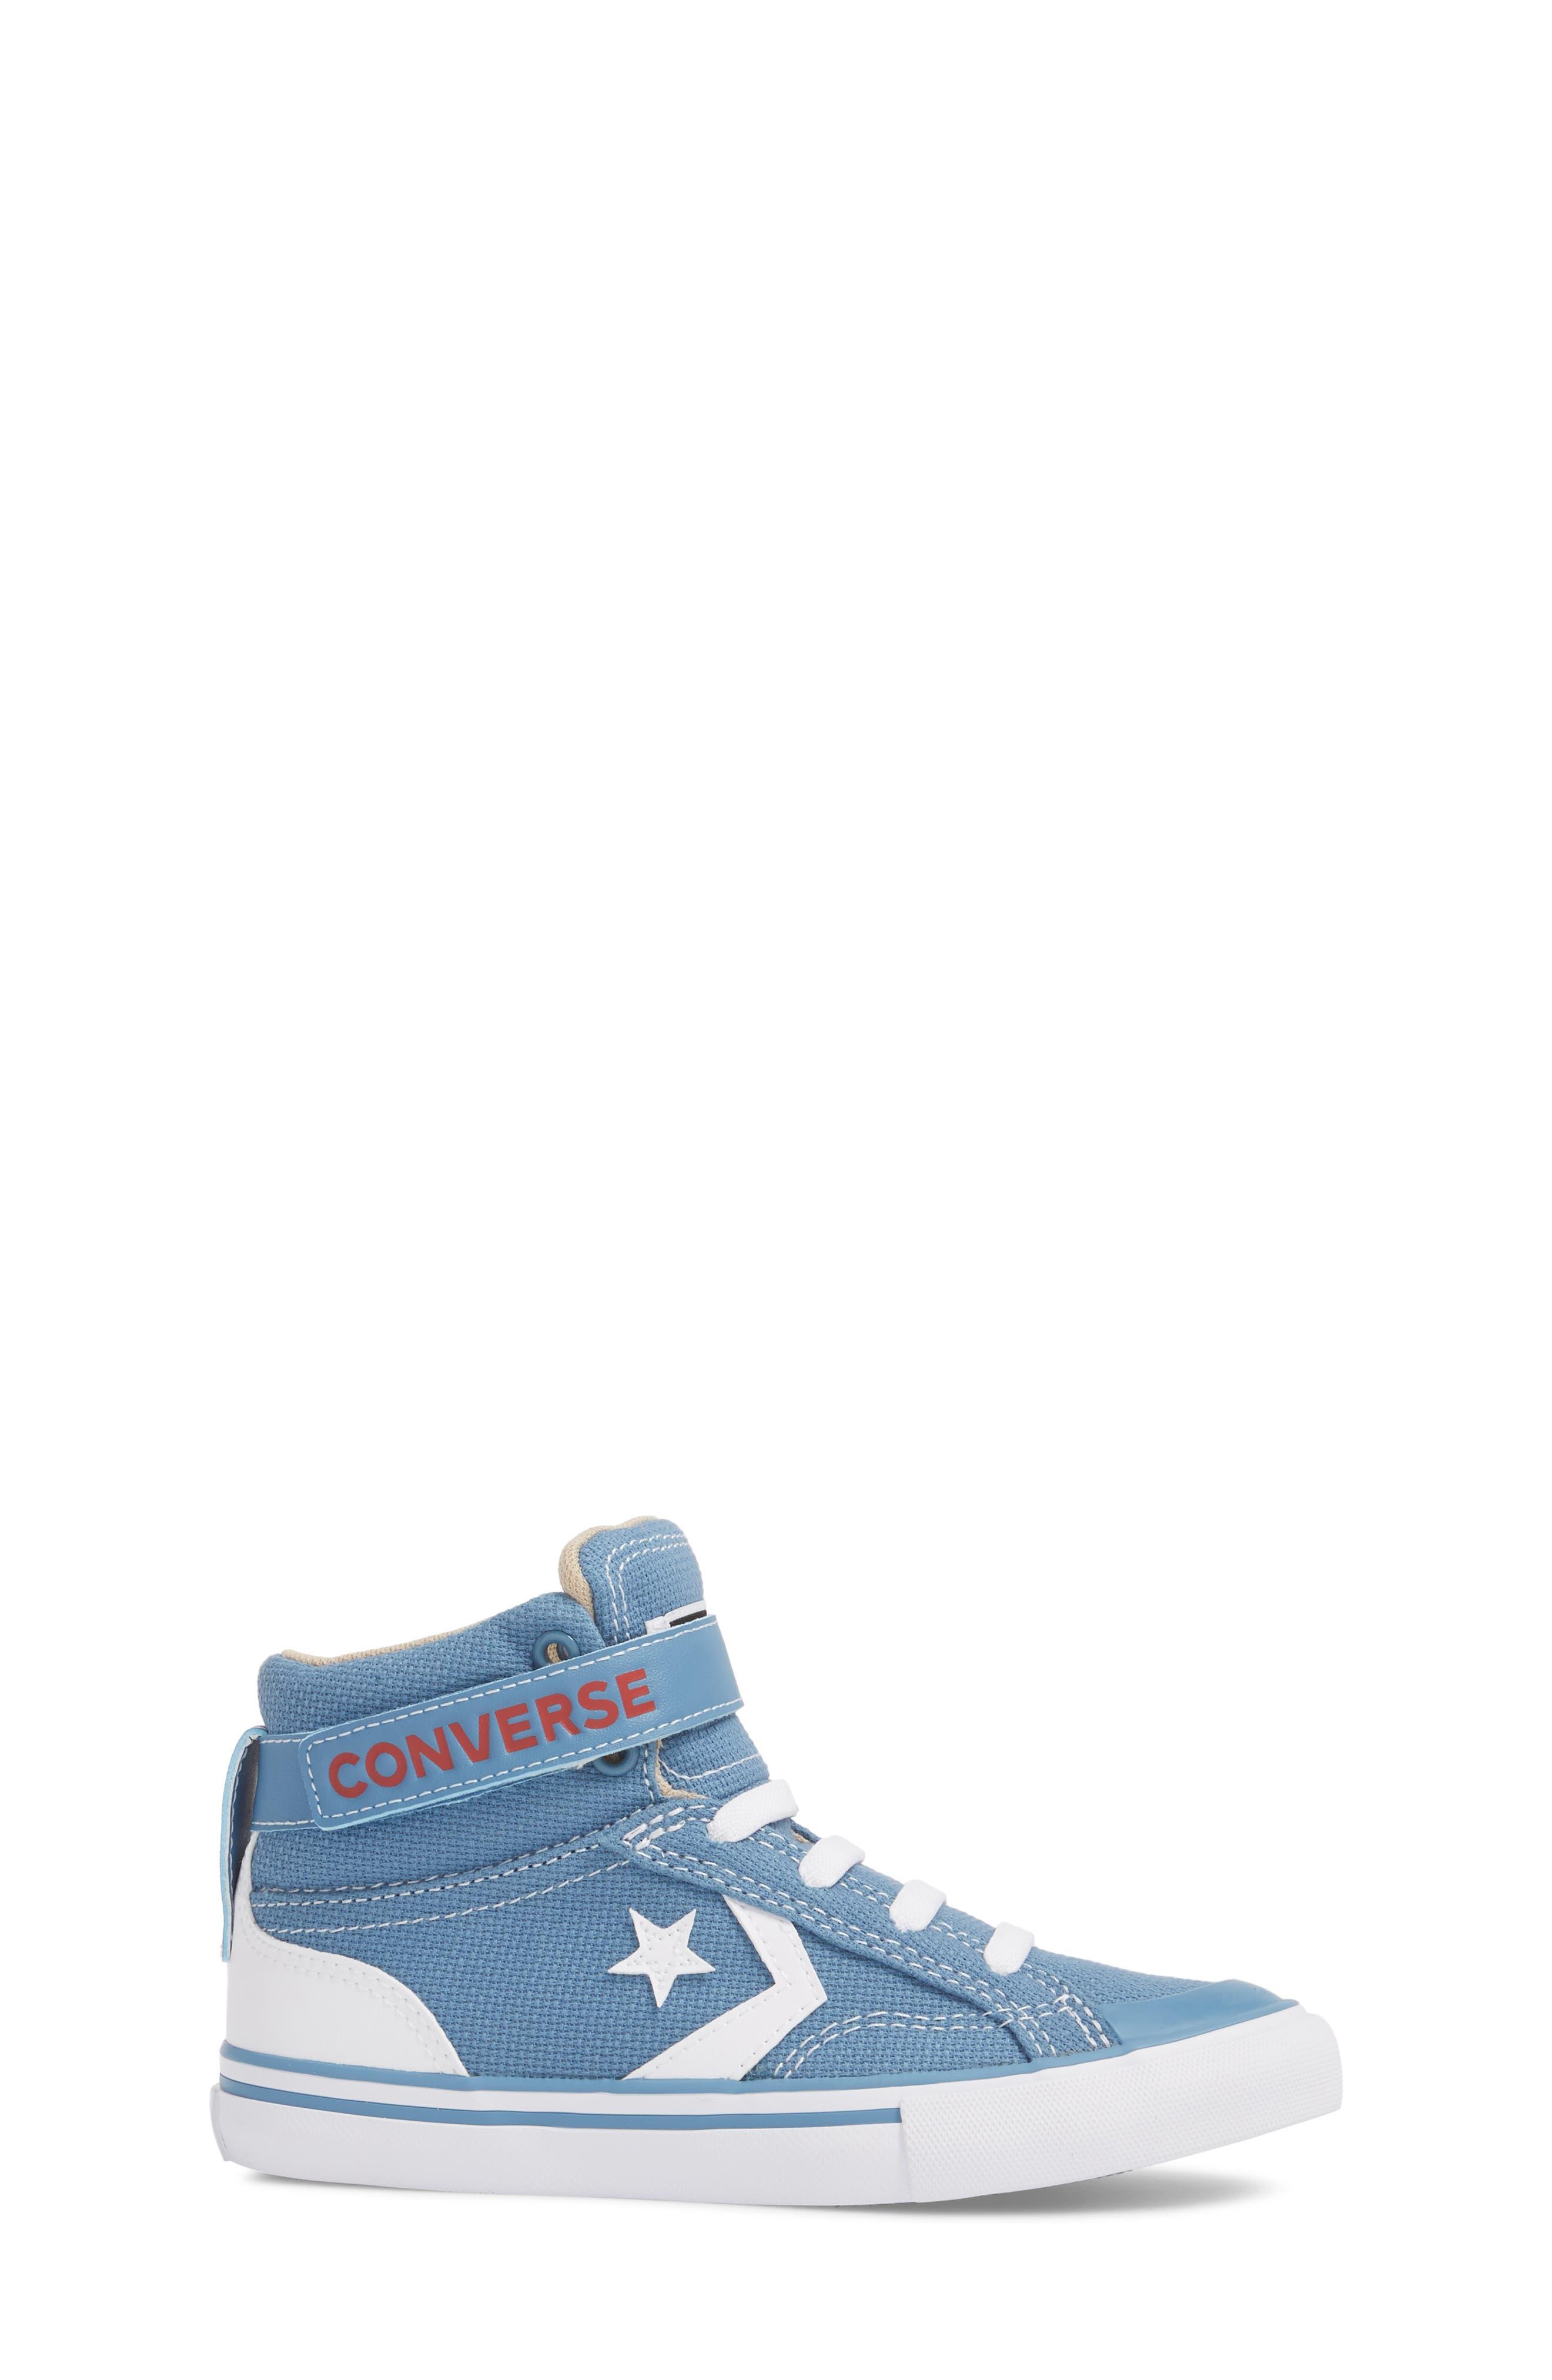 Alternate Image 3  - Converse Pro Blaze High Top Sneaker (Toddler, Little Kid & Big Kid)